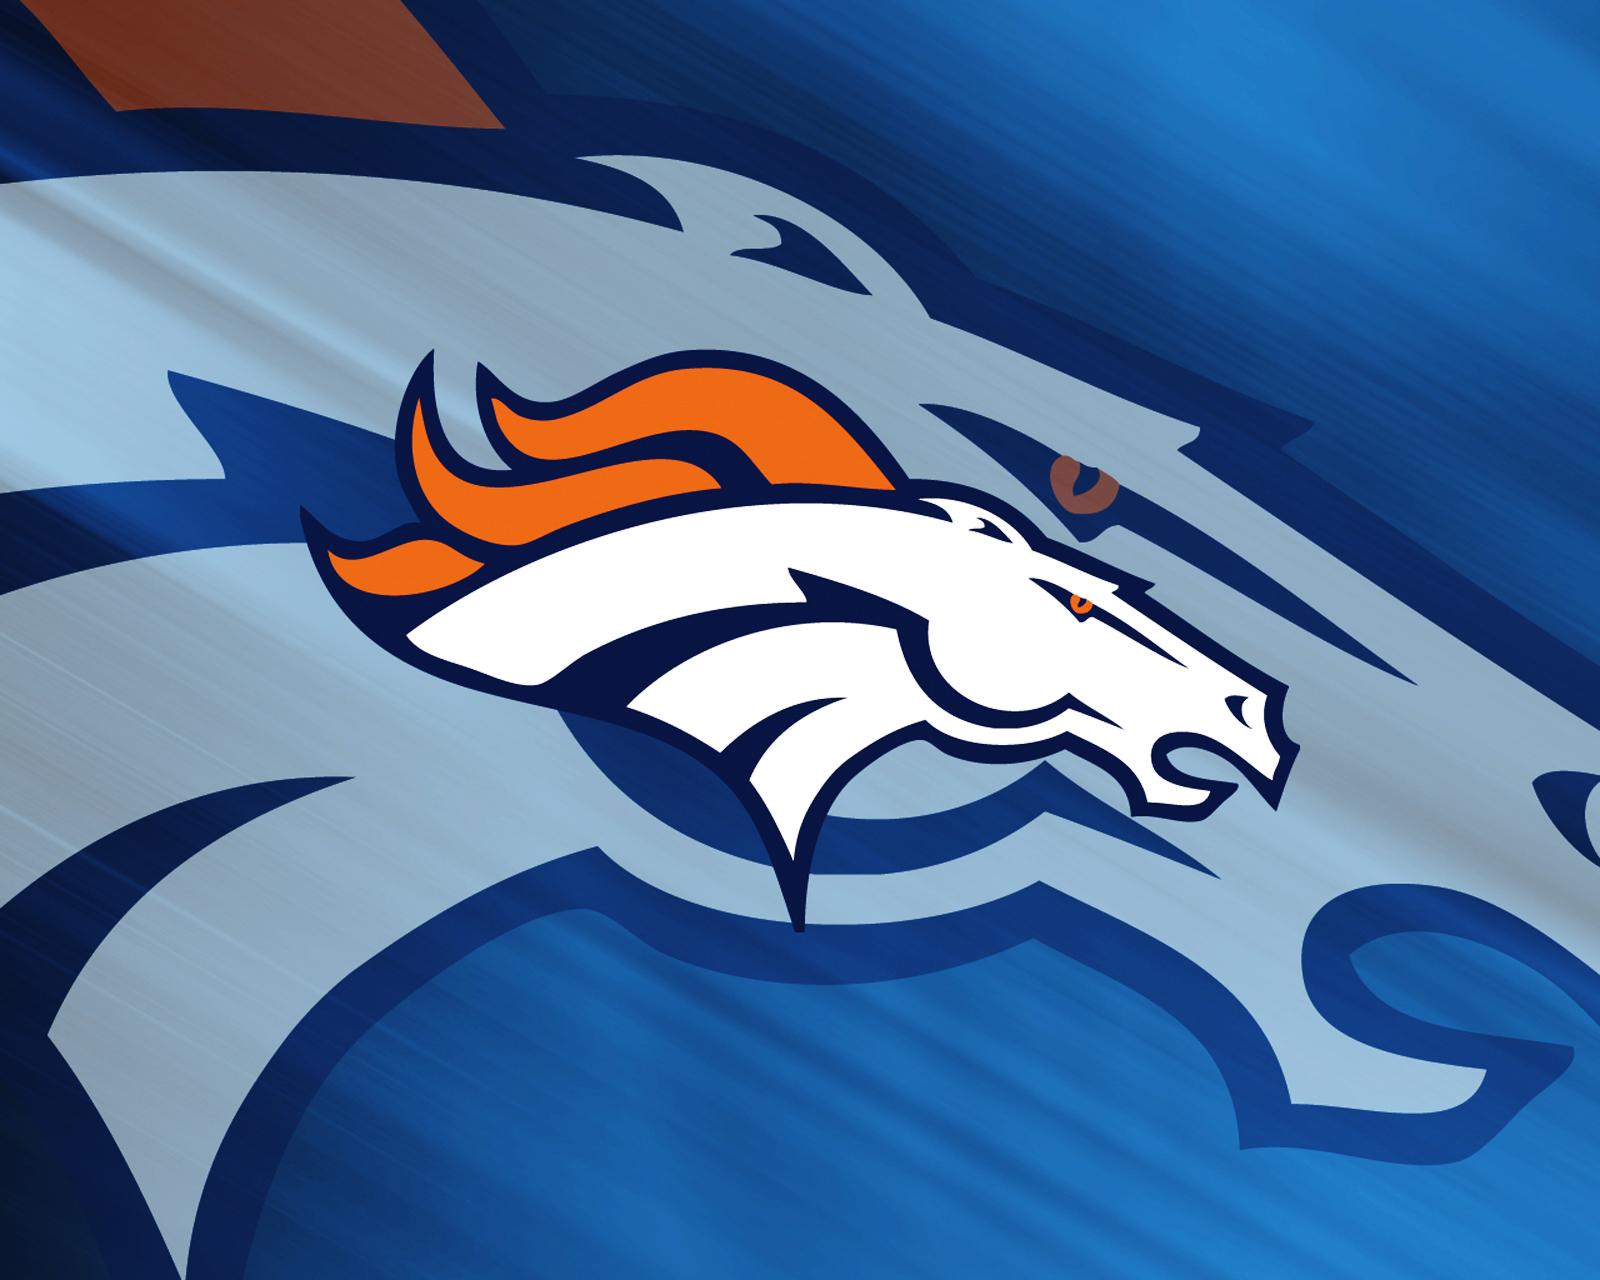 football art bronco denver graphic and design helmet horse logo nfl 1600x1280